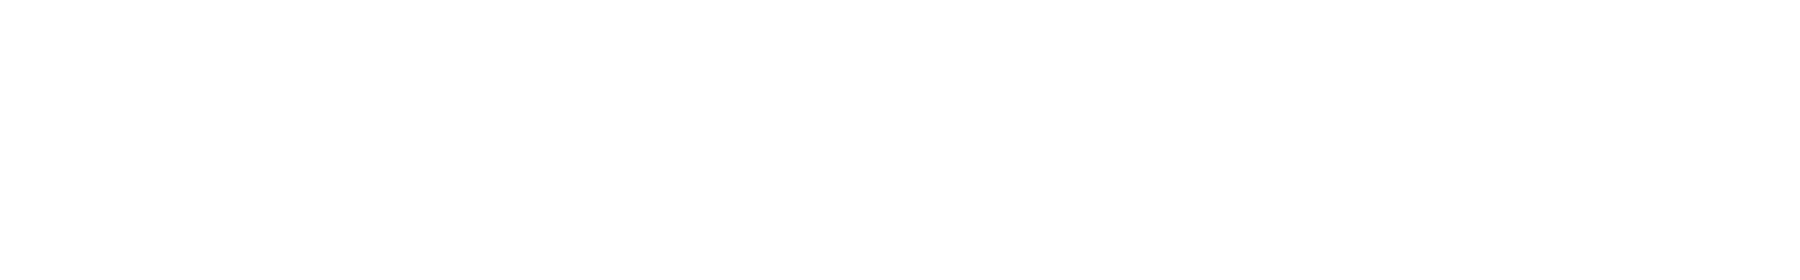 808 5